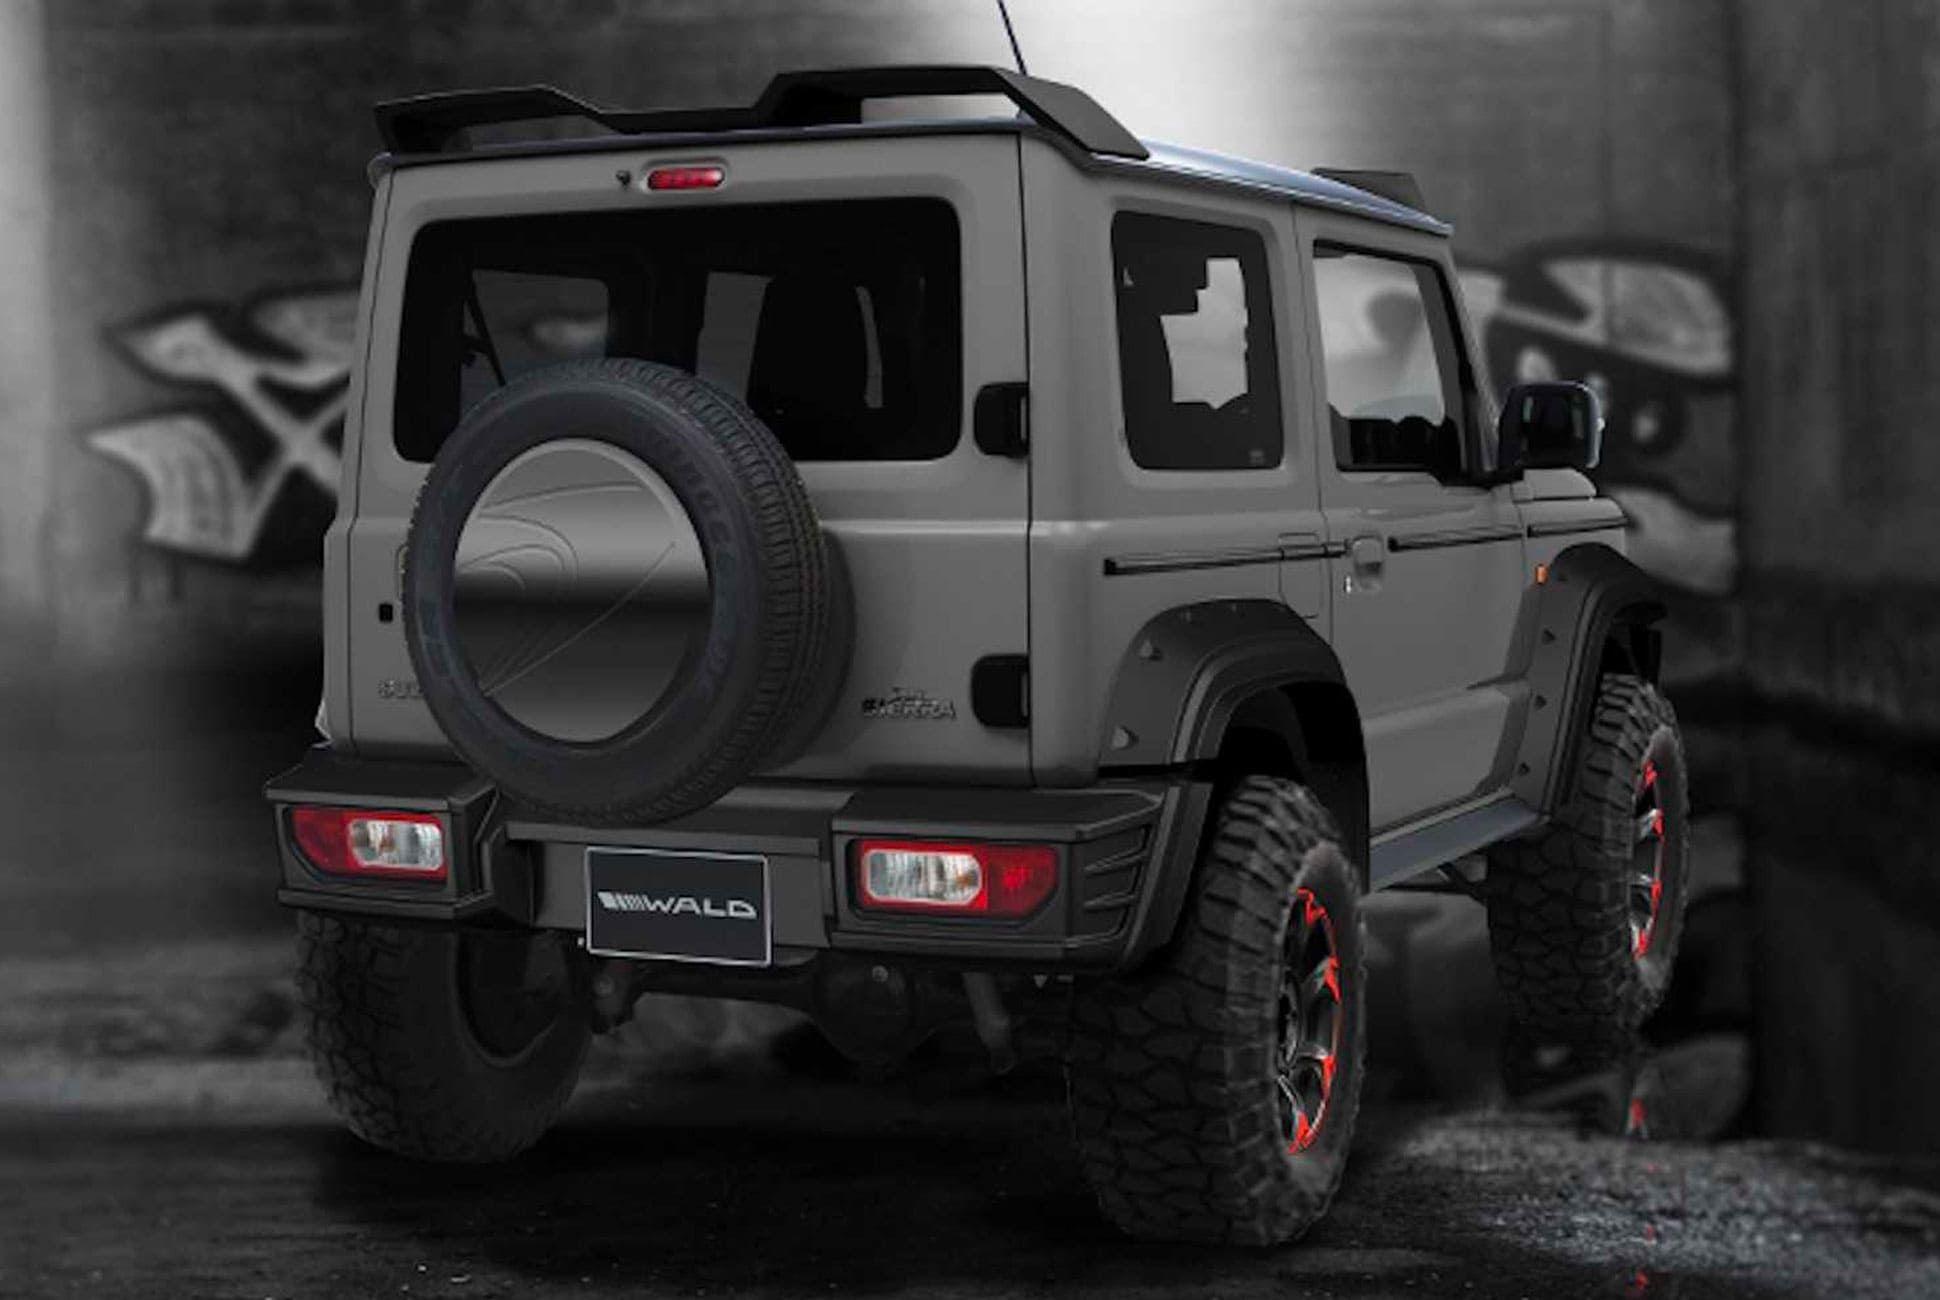 Suzuki-Jimny-Black-Bison-gear-patrol-slide-02